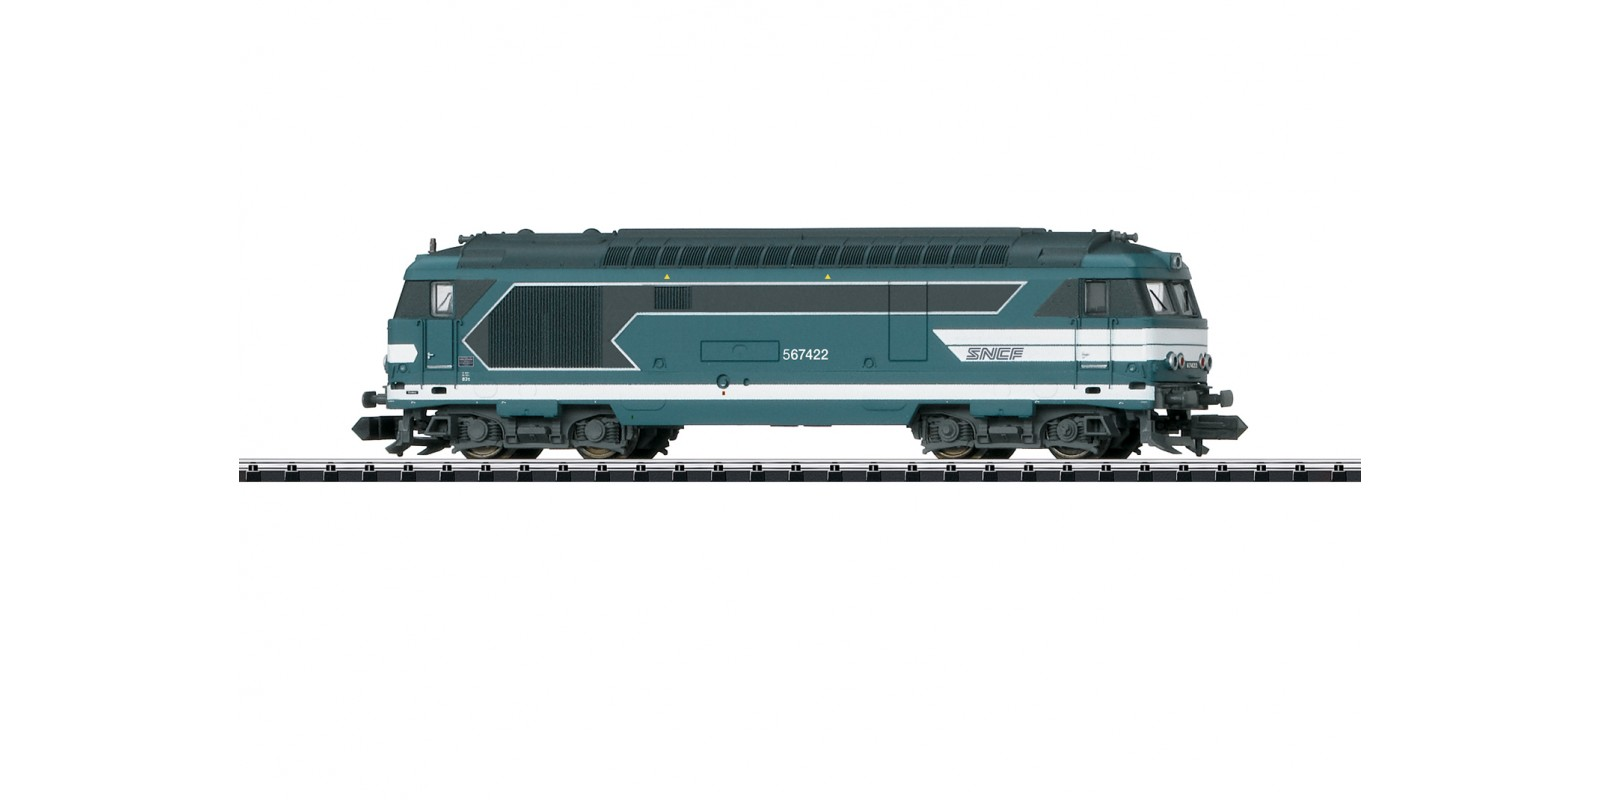 T16705 Class BB 67400 Diesel Locomotive